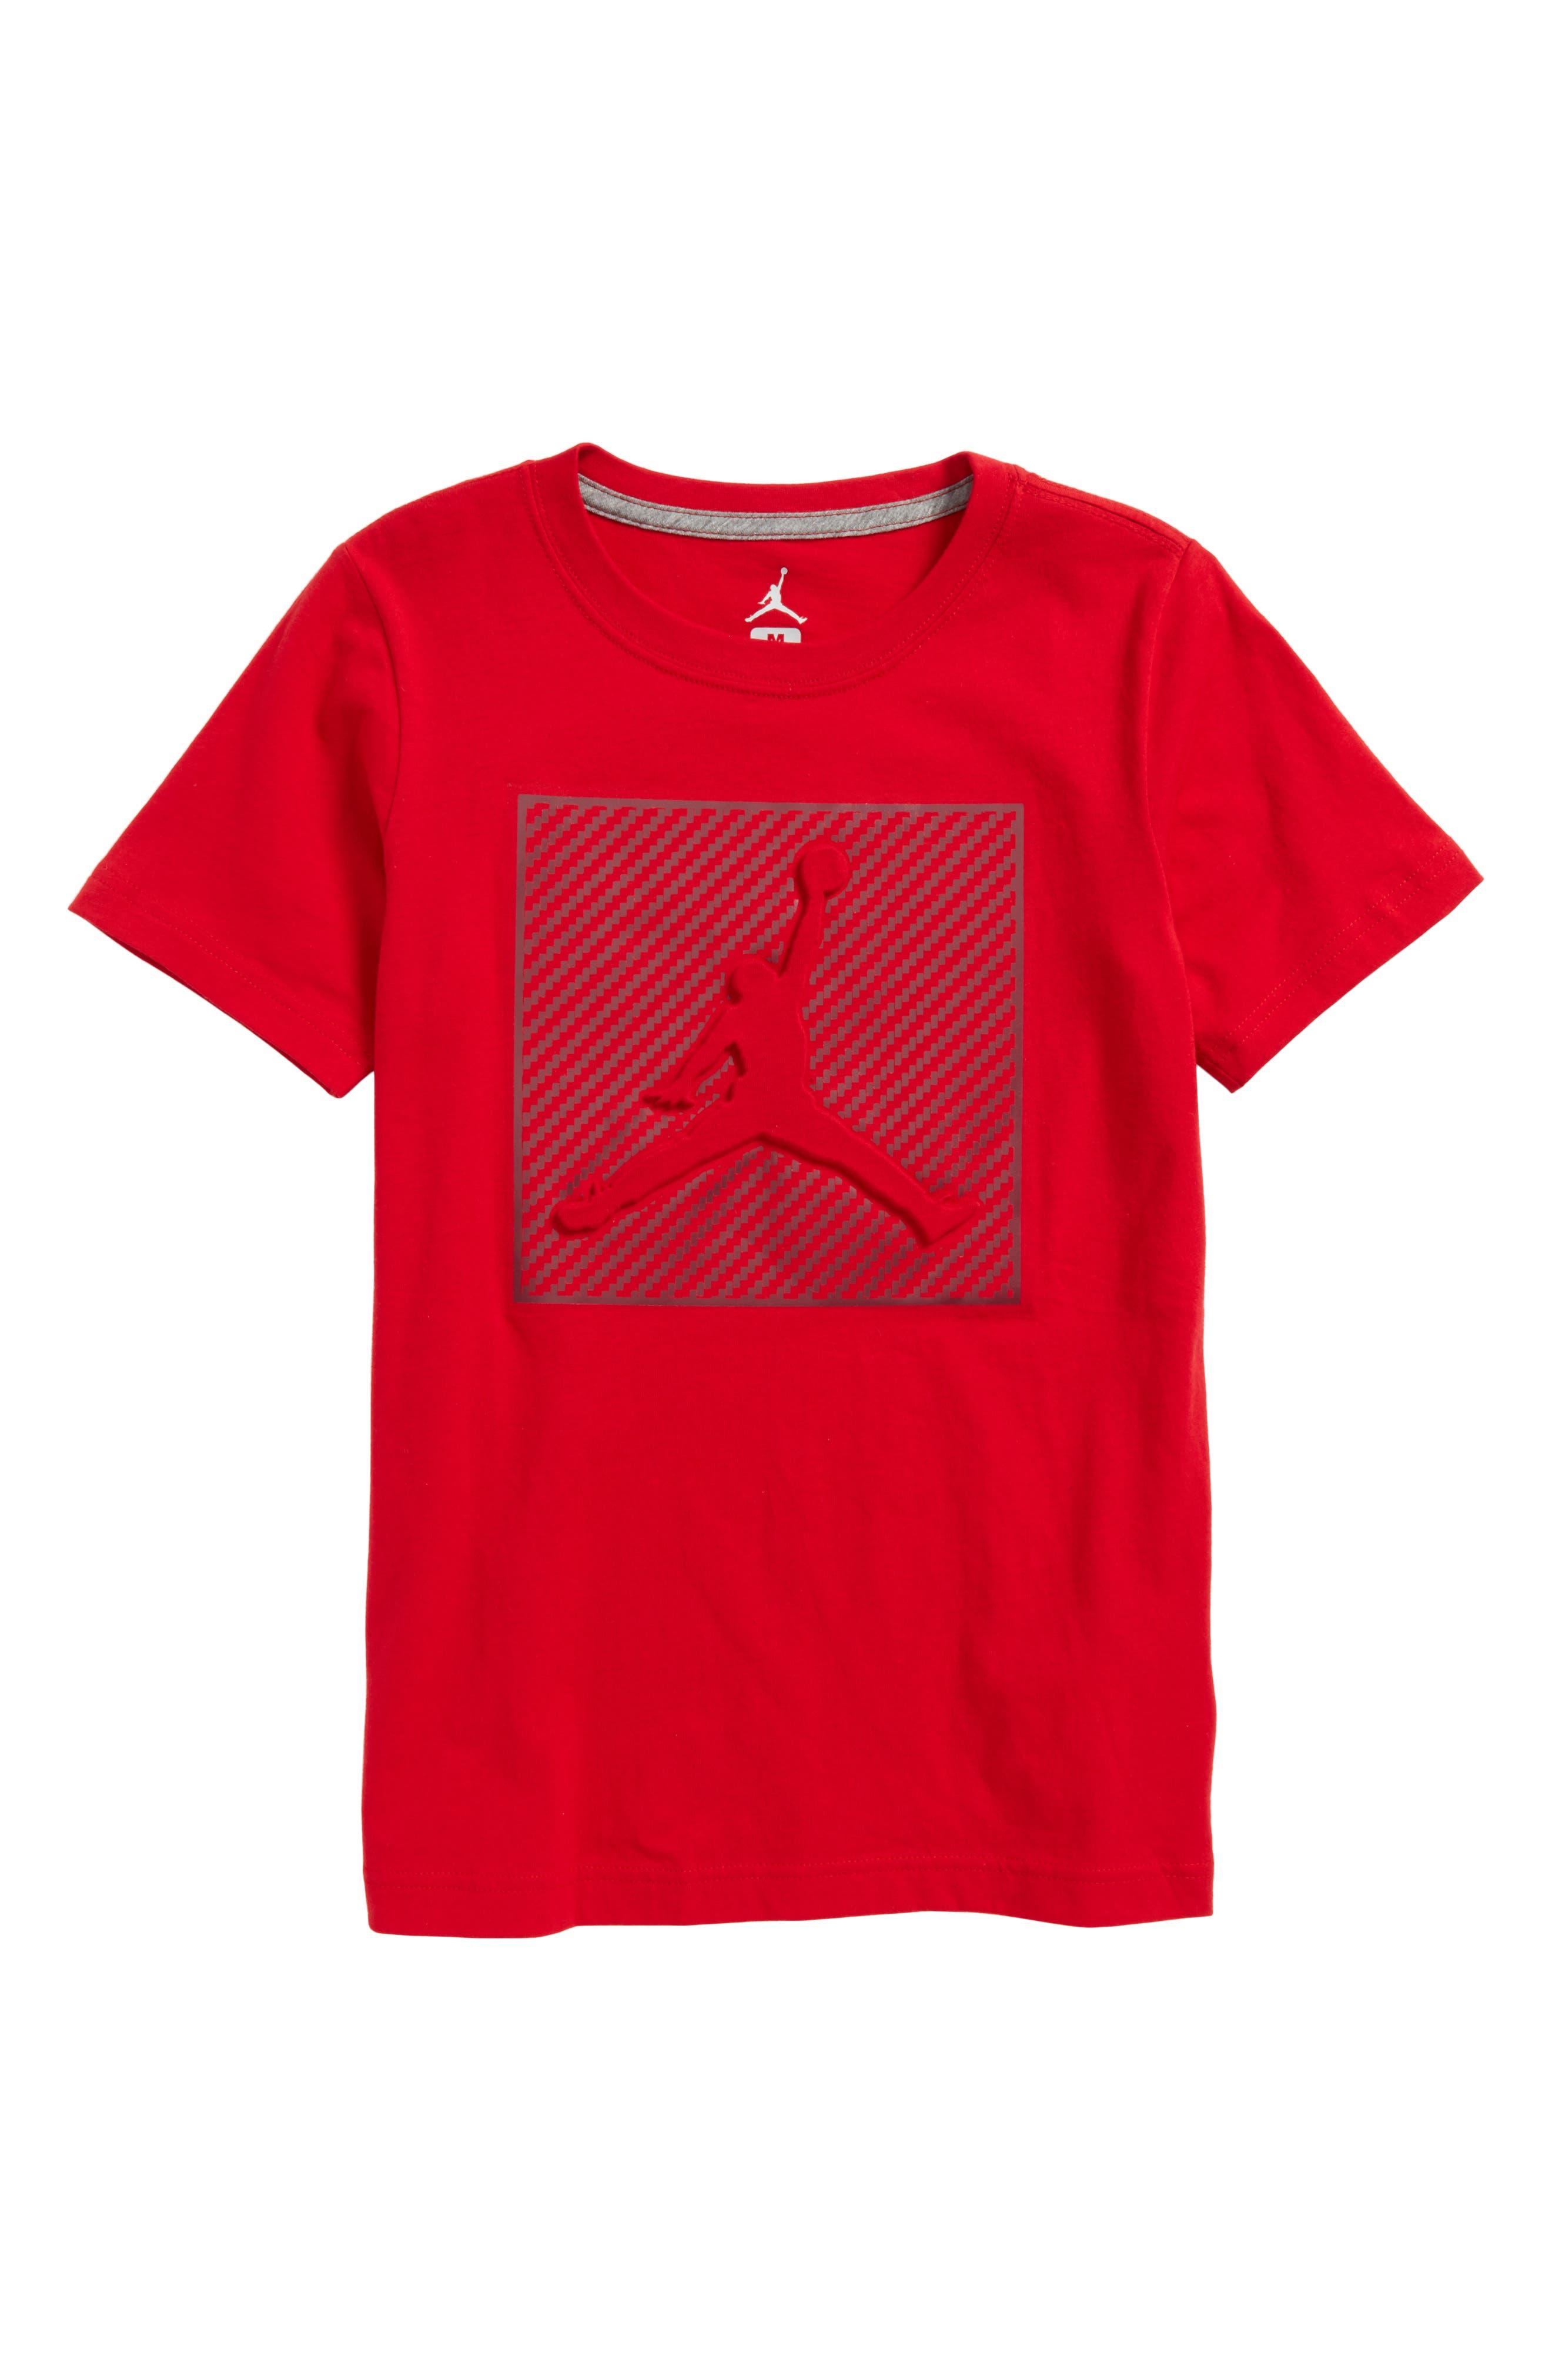 Jordan AJ Emboss Carbon T-Shirt,                             Main thumbnail 1, color,                             606